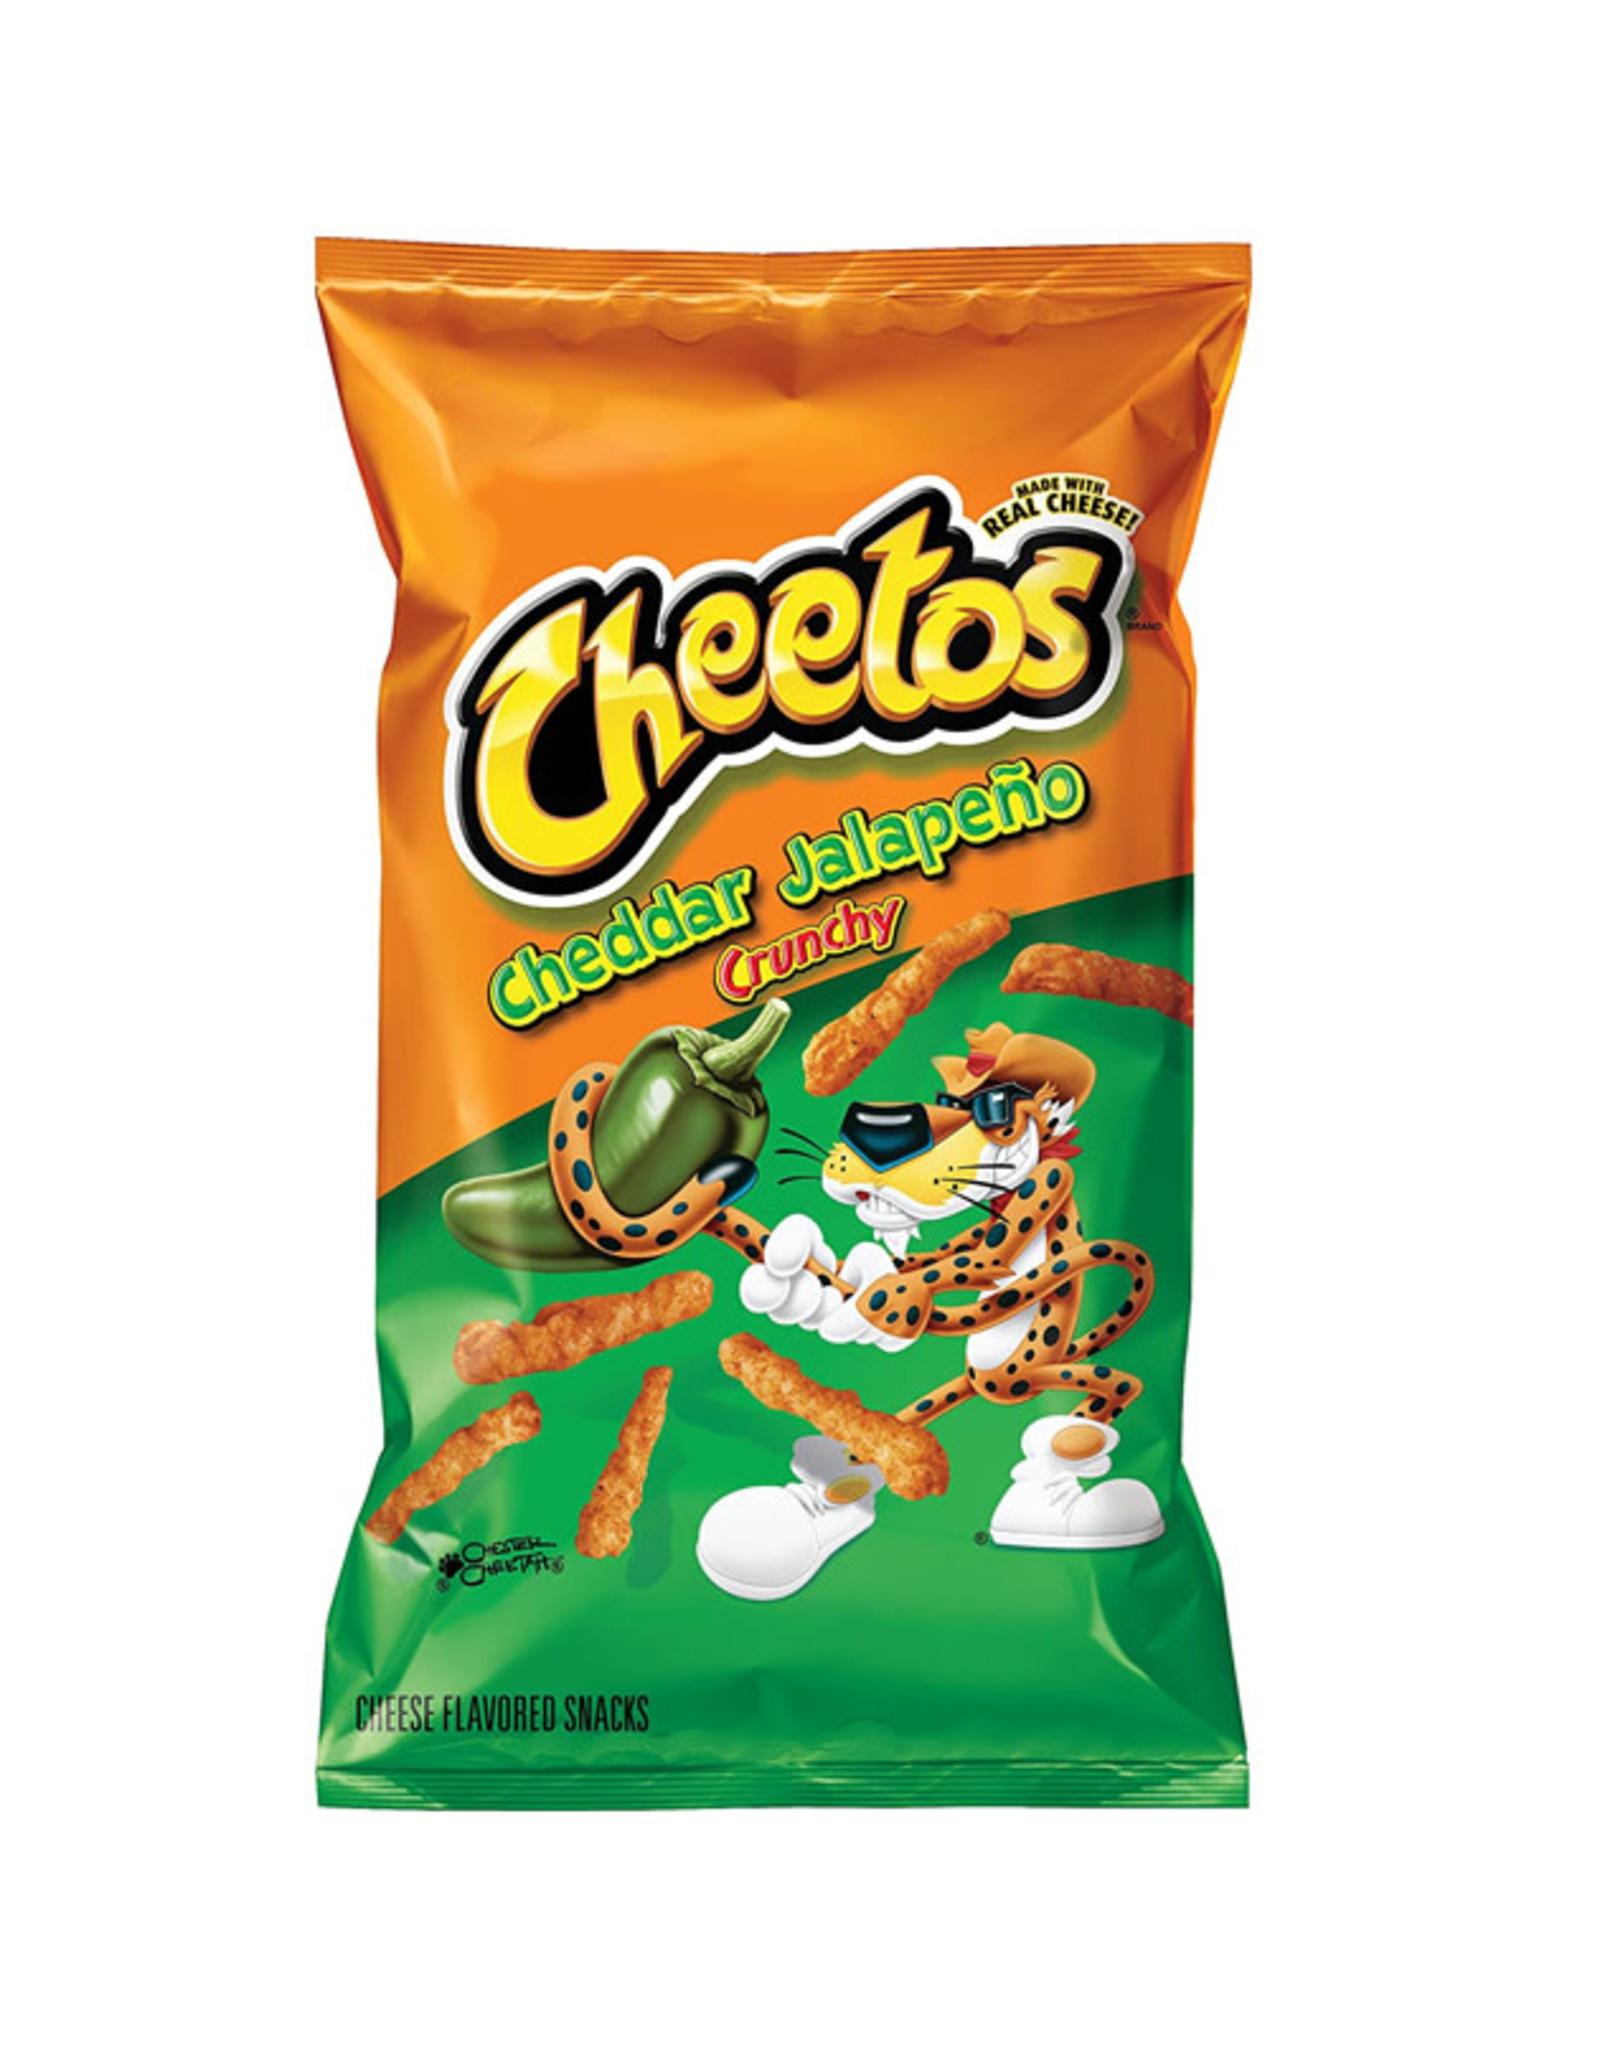 Cheetos Crunchy Cheddar Jalapeño - Groot - 226g